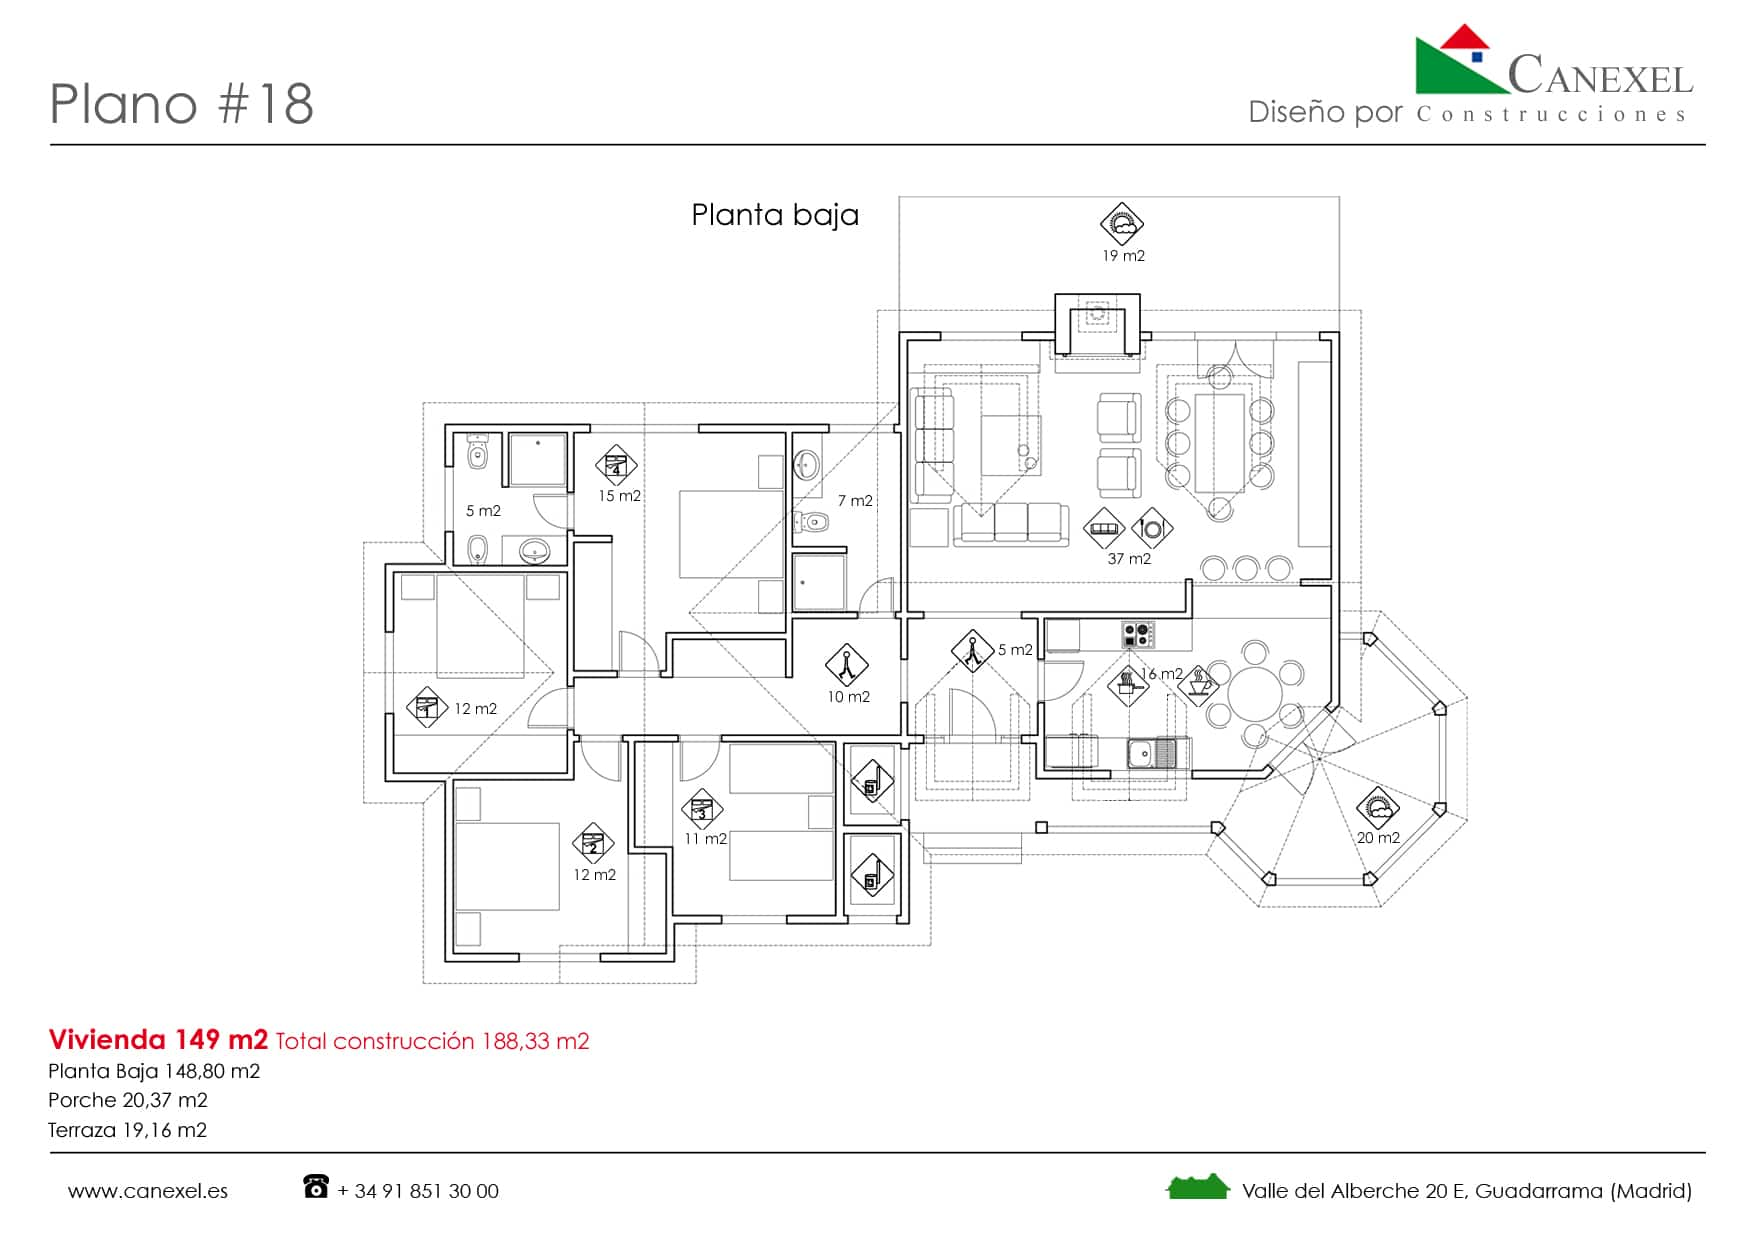 Planos de casas de una planta canexel for Disenos de casas 120 m2